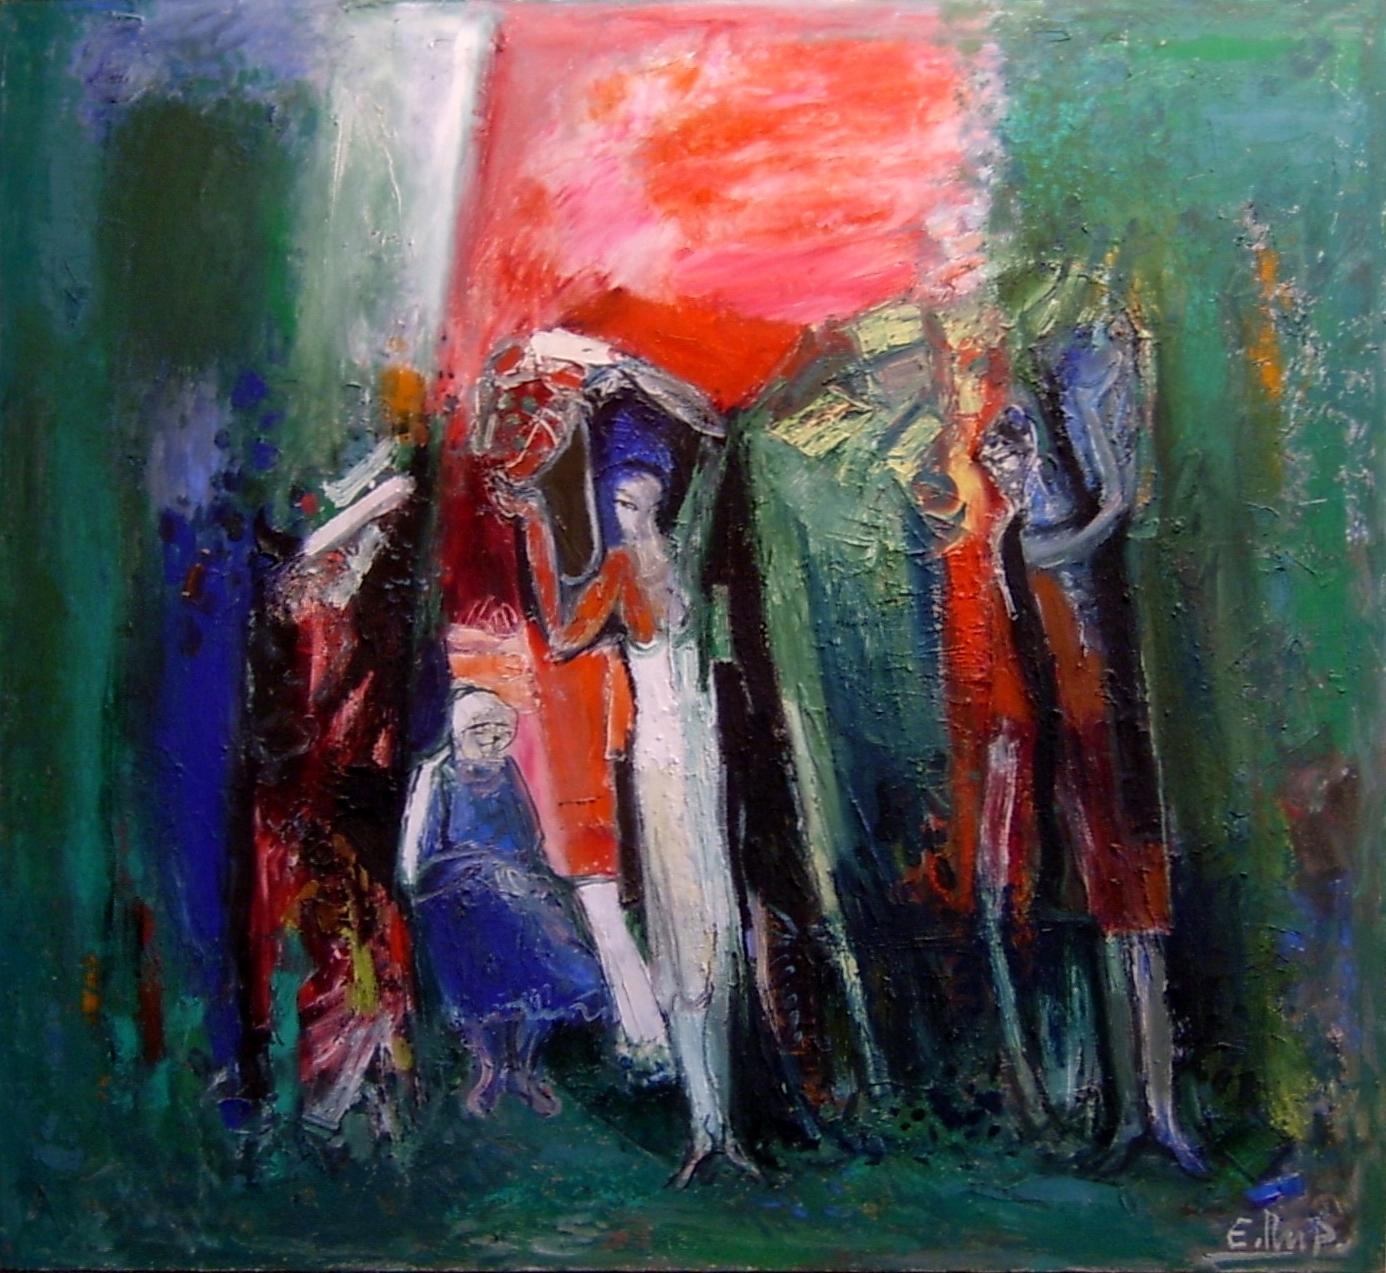 Exposition Encho Pironkov- City Art Gallery